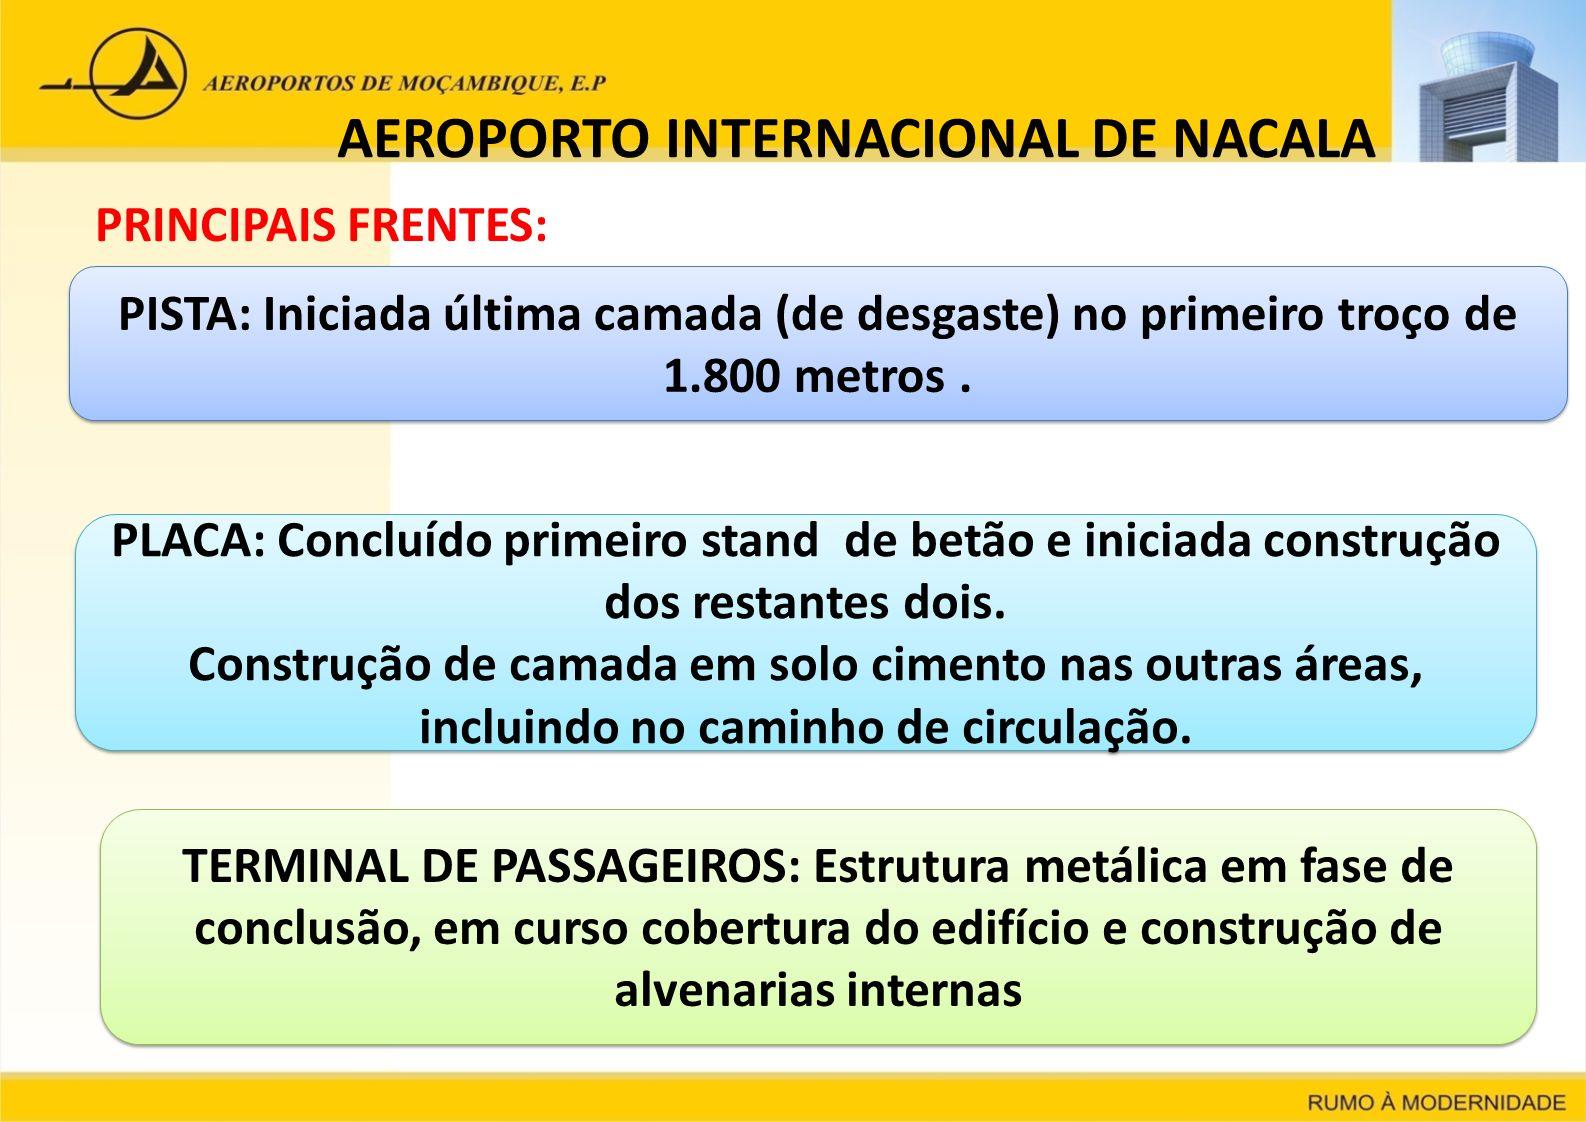 AEROPORTO INTERNACIONAL DE NACALA PRINCIPAIS FRENTES: PISTA: Iniciada última camada (de desgaste) no primeiro troço de 1.800 metros. PLACA: Concluído